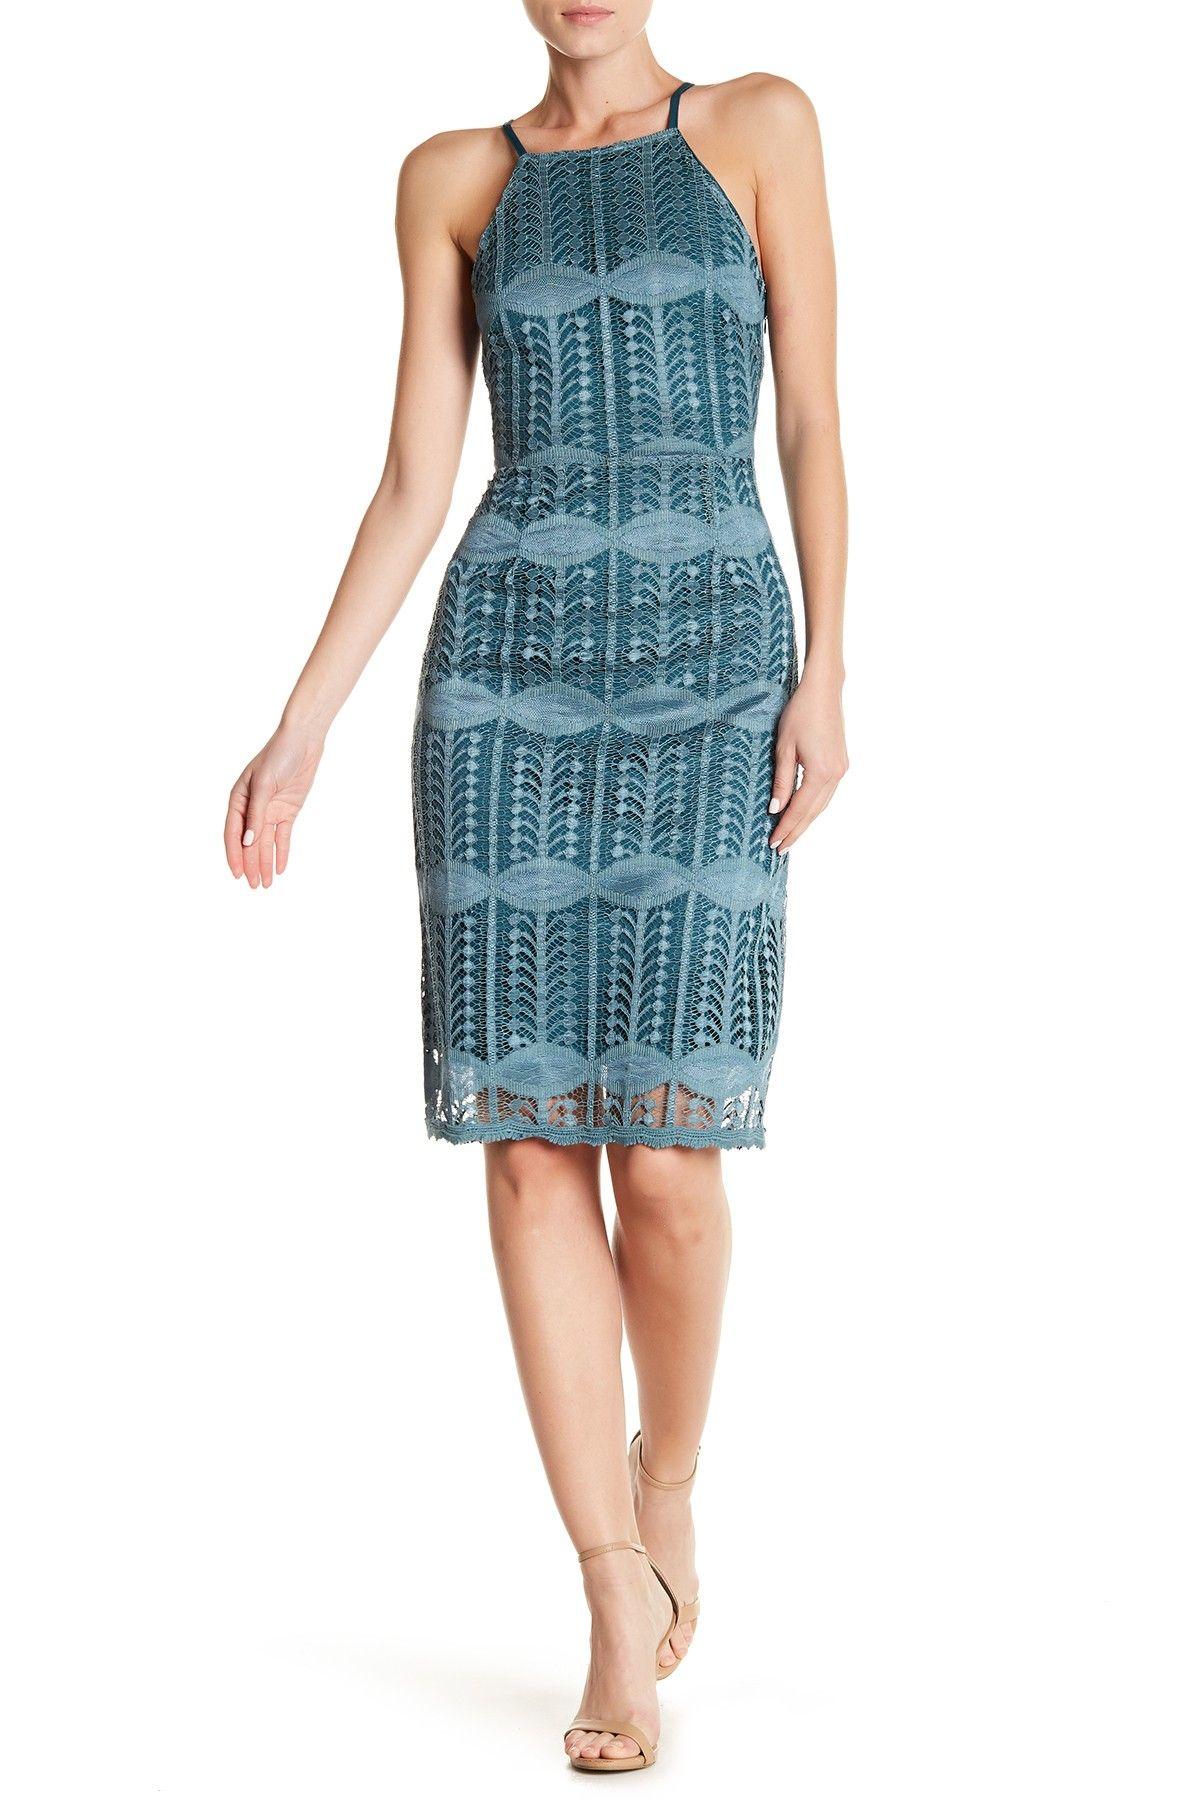 Nsr Lace Halter Dress Nordstrom Rack Lace Halter Dress Cocktail Dress Party Dresses [ 1800 x 1200 Pixel ]